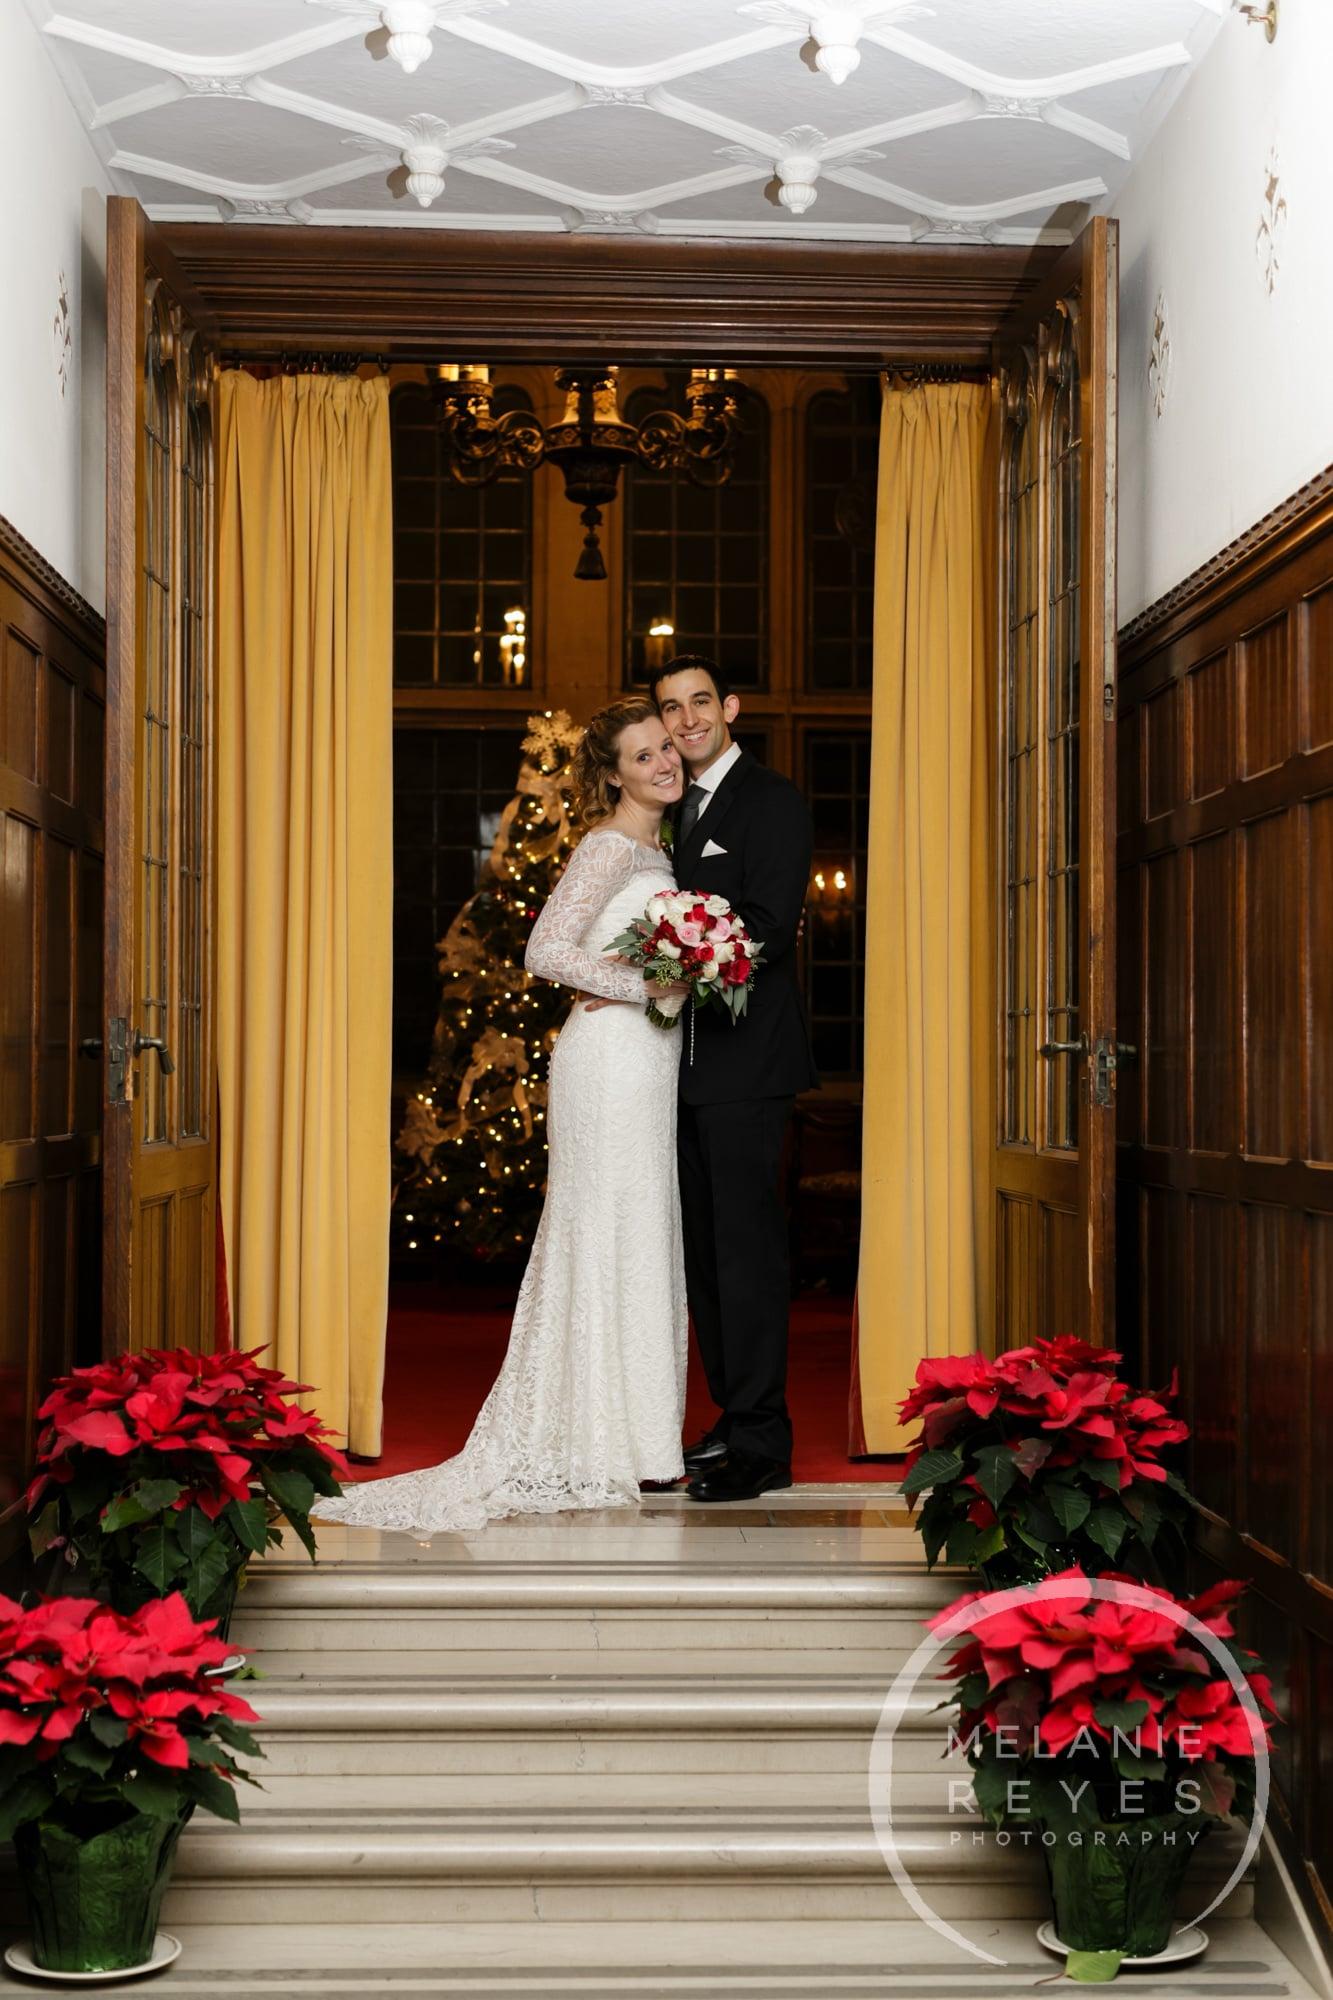 2015_ann_arbor_wedding_photographer_melaniereyes_038.JPG